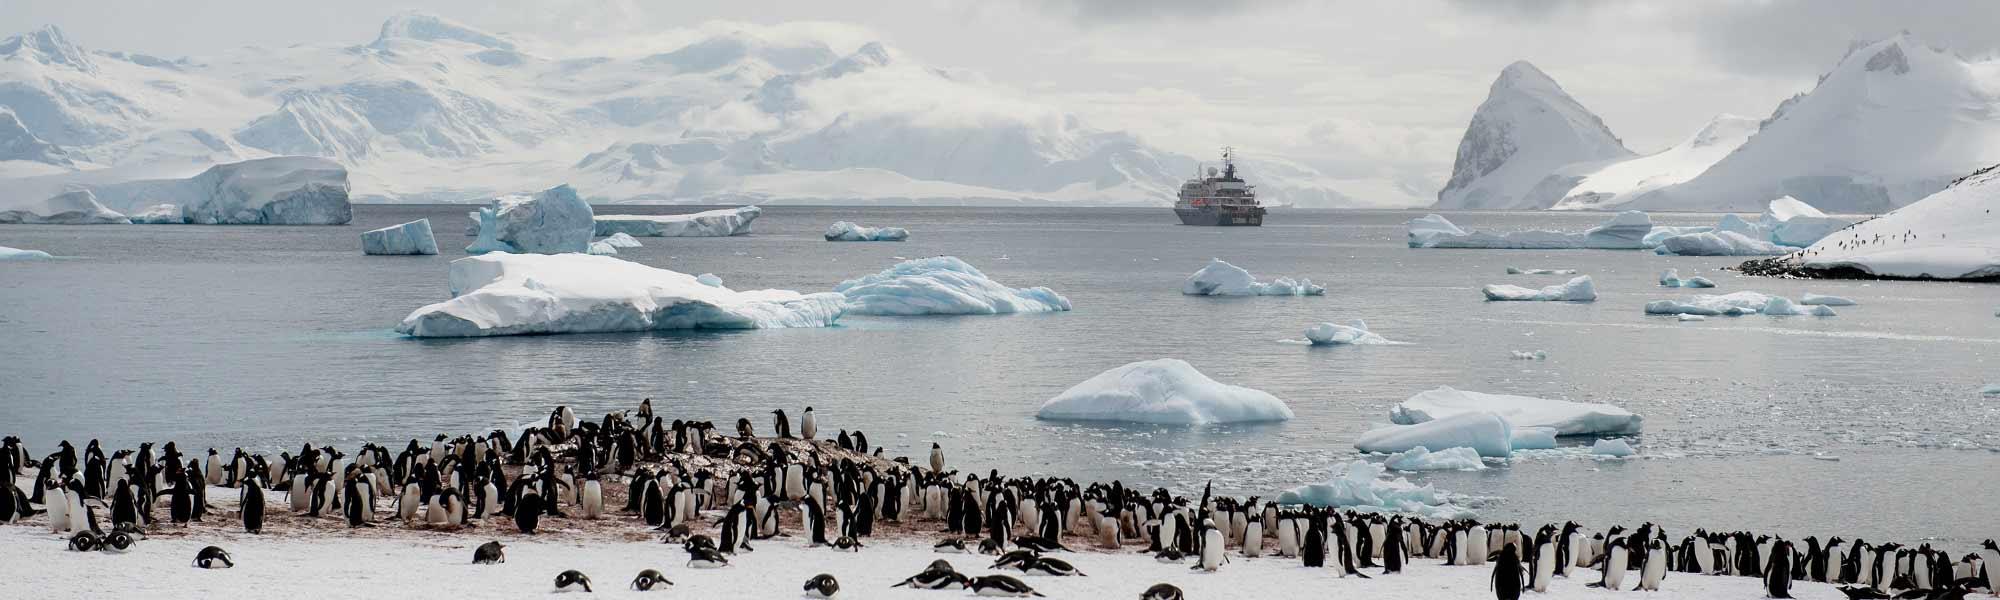 World-Leading Luxury & Expedition Ships